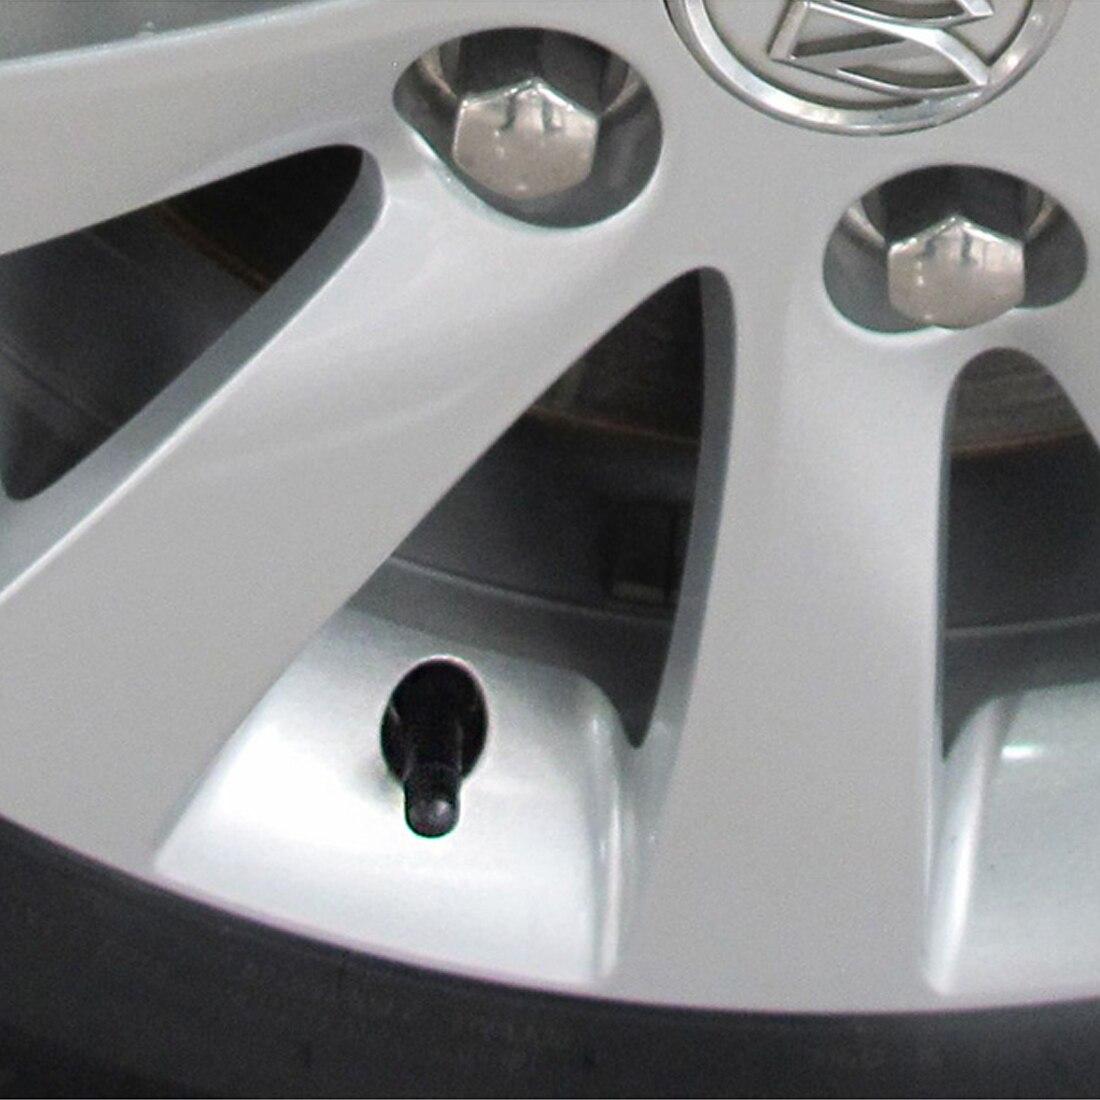 Dewtreetali Neue Sensor Ventil Stem 4Pcs TPMS Tire Pressure Monitoring System Anti-explosion Snap In Reifen Ventil Vorbauten snap